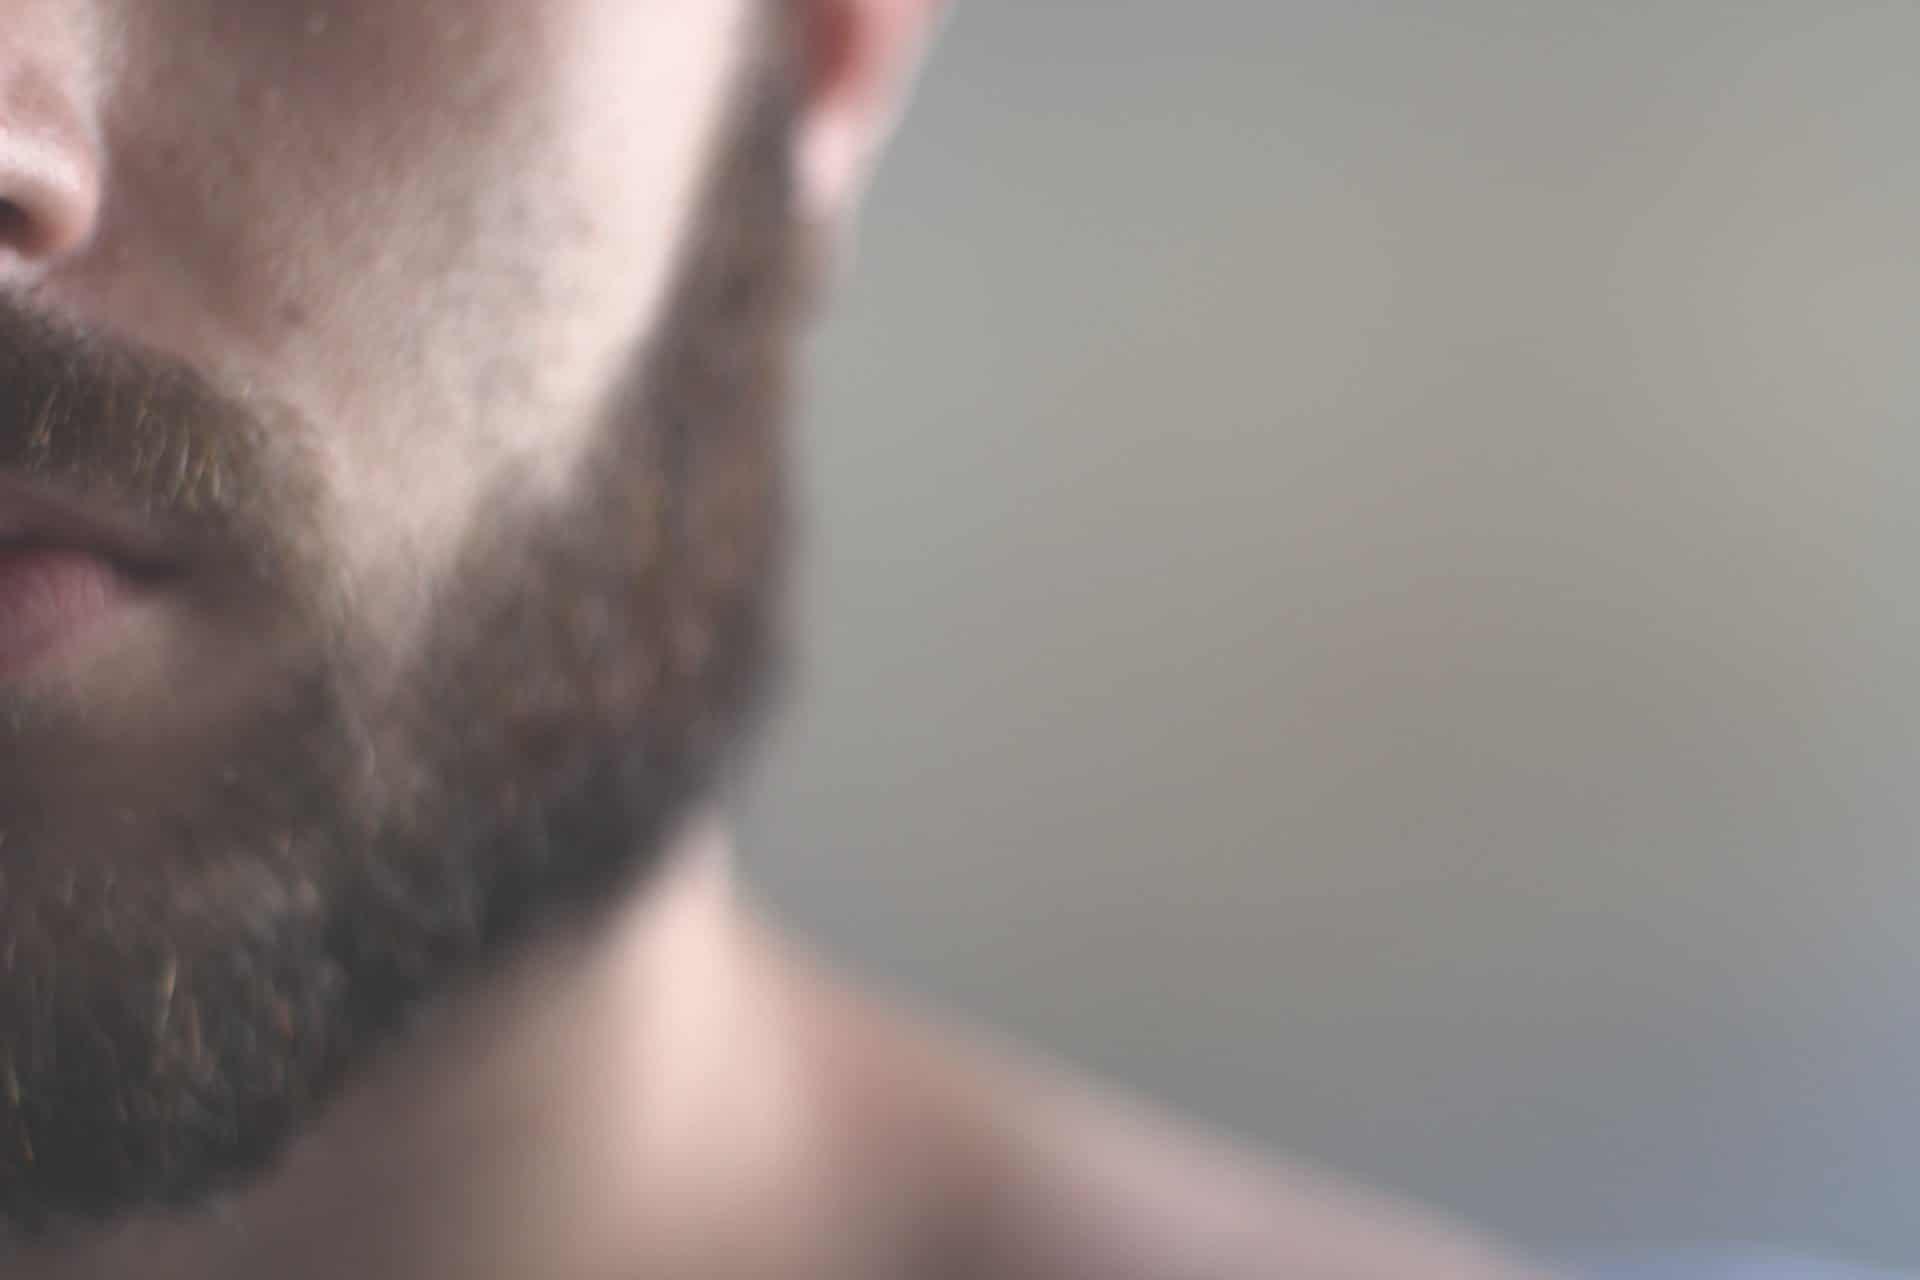 Hilfe bei Schuppen im Bart